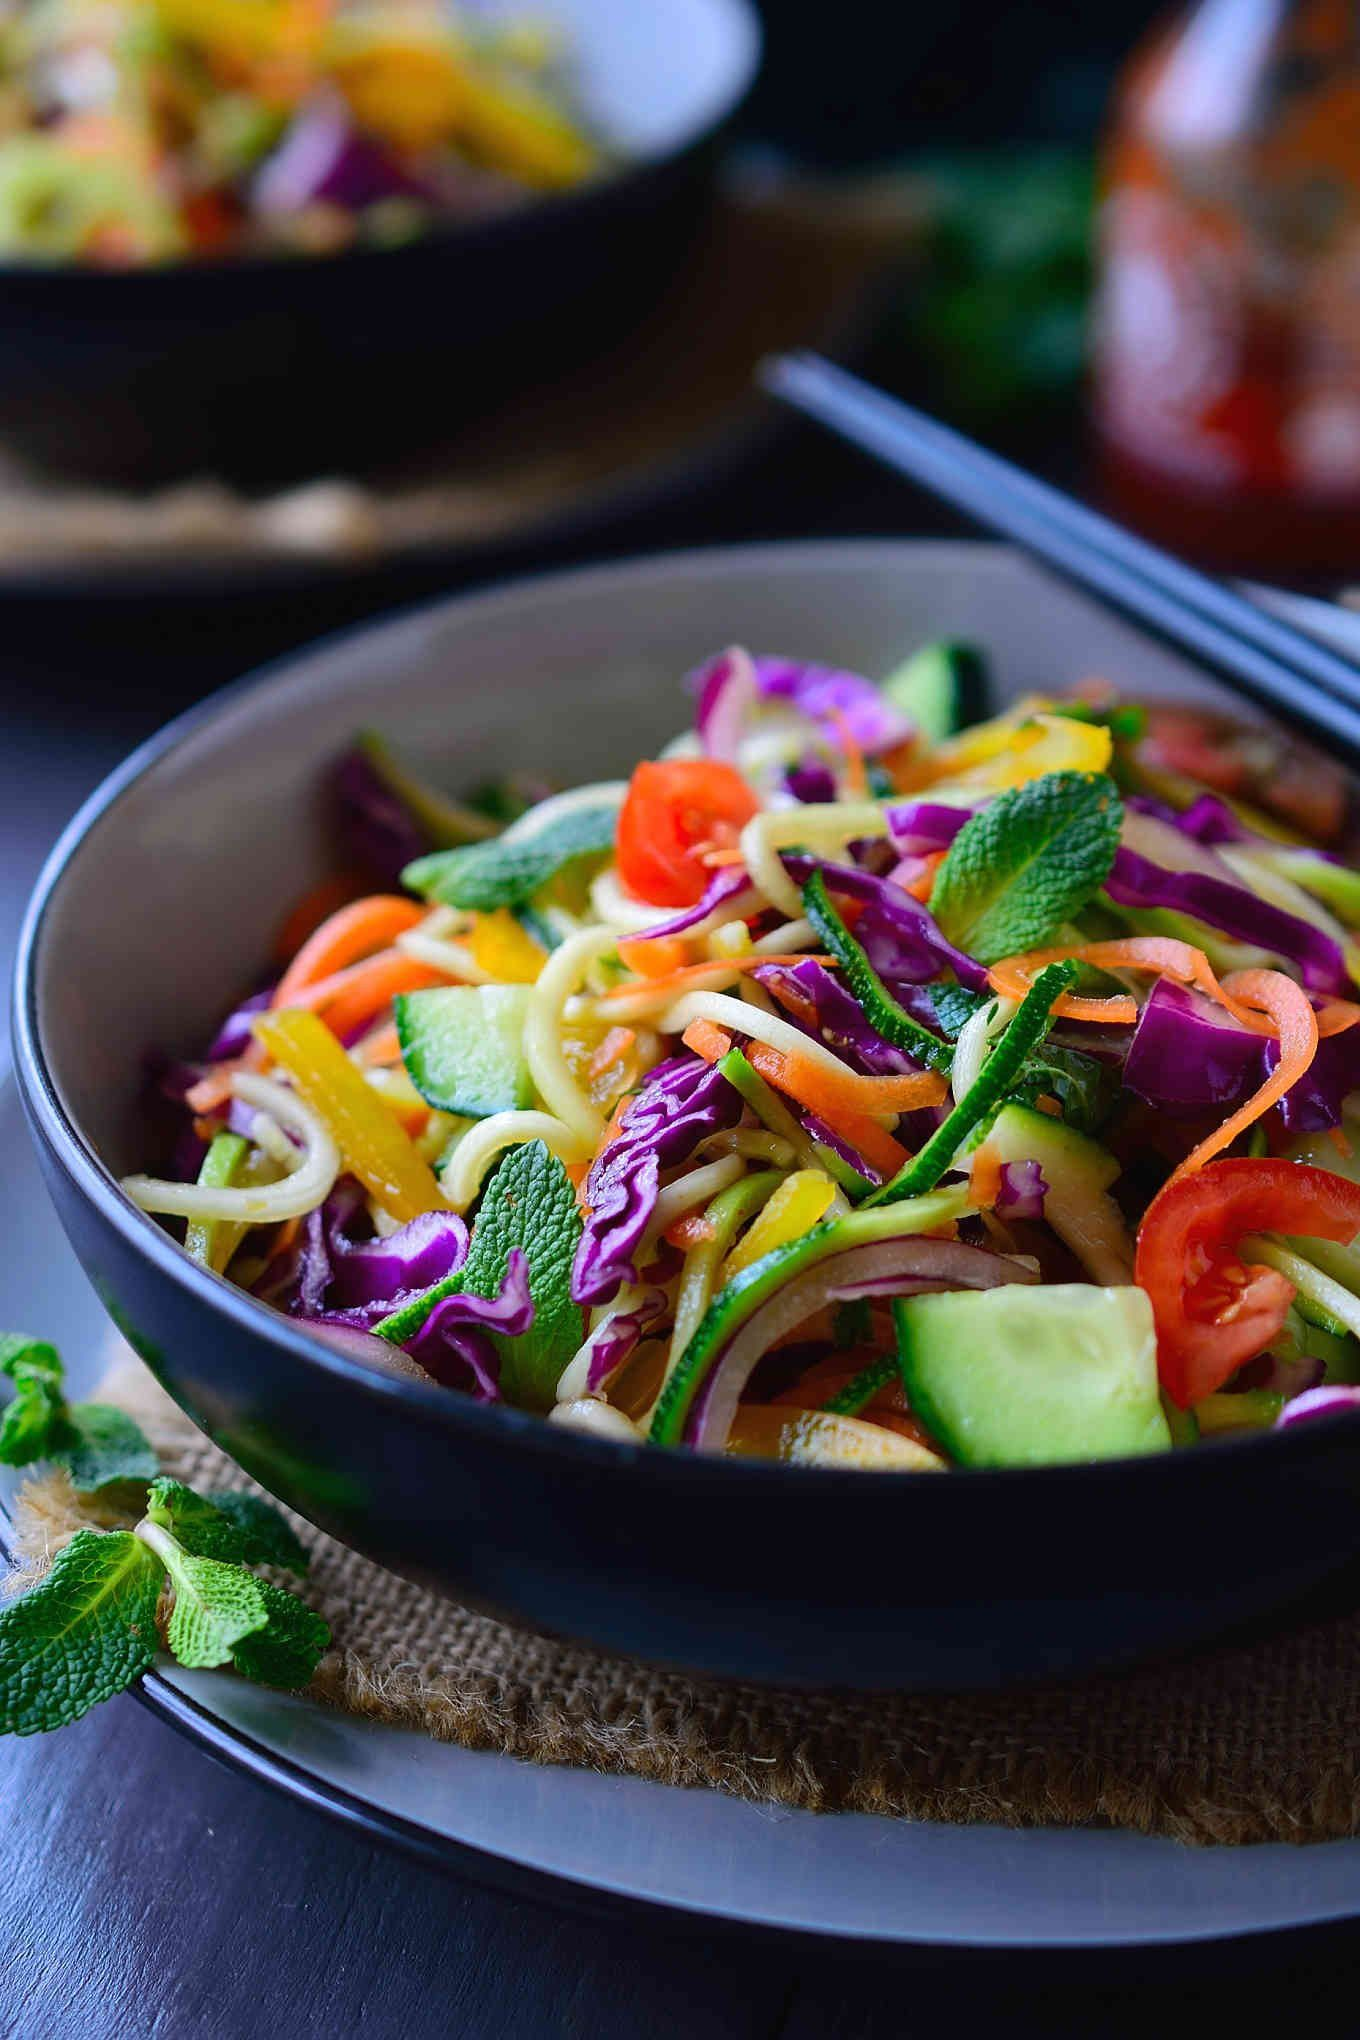 This raw vegan noodles salad recipe is super quick and easy to put this raw vegan noodles salad recipe is super quick and easy to put together and is forumfinder Gallery